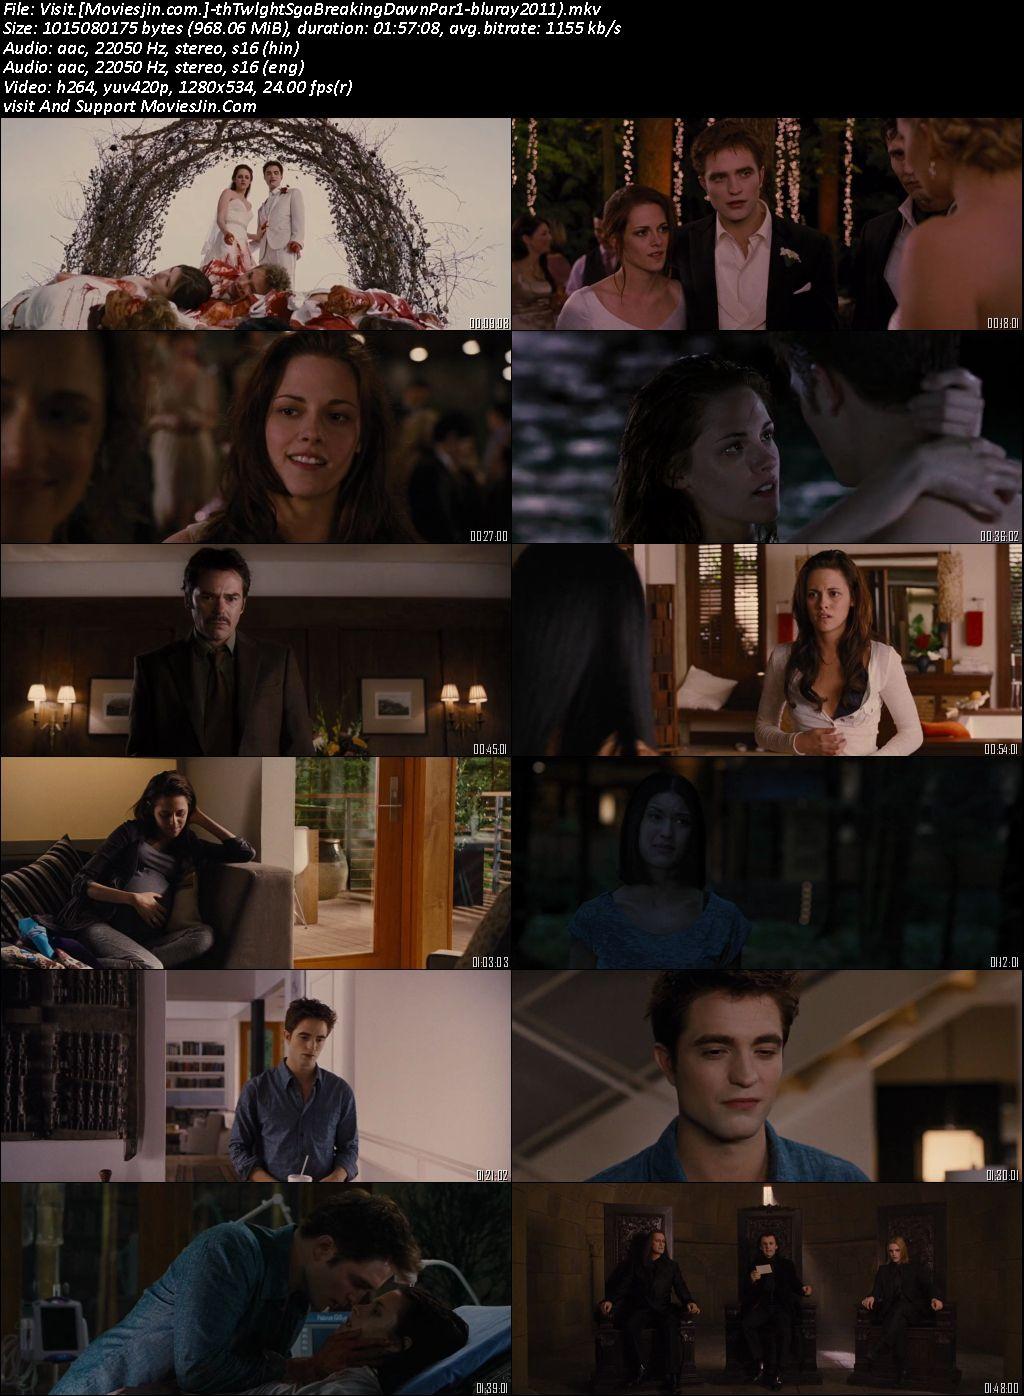 Twilight Saga Breaking Dawn Part 1 2011 BRRIp Hindi Dual Audio 720p